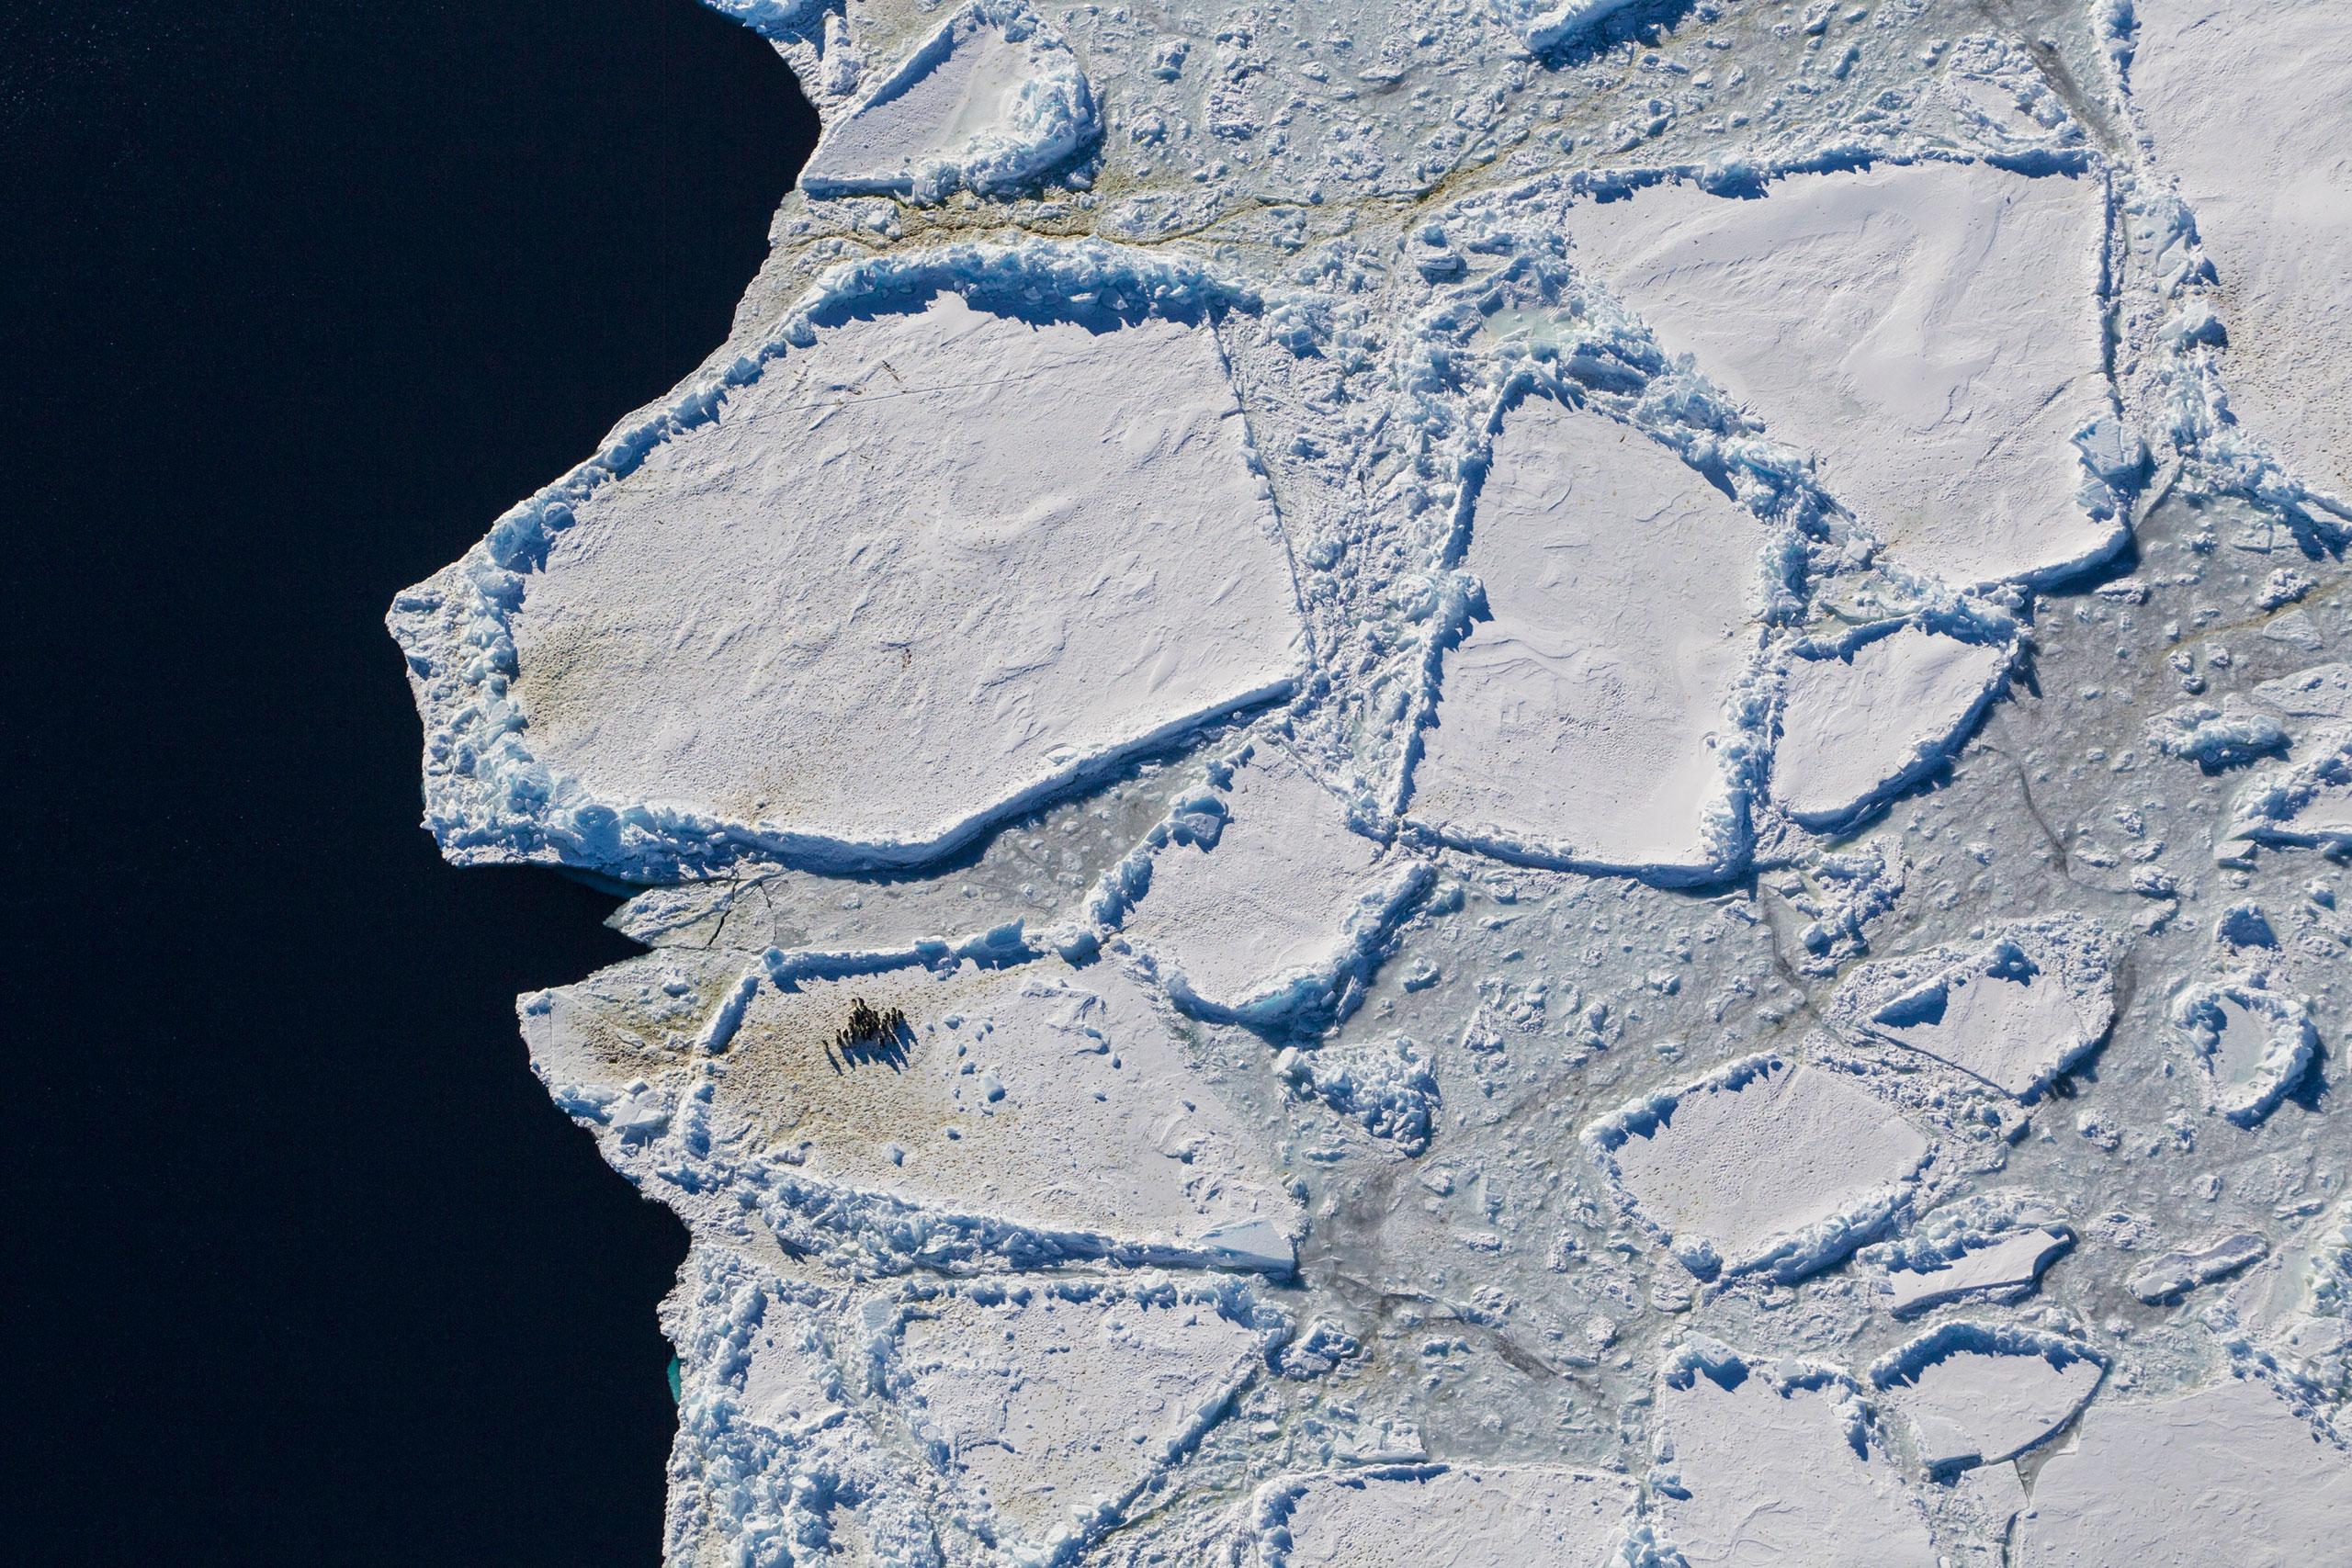 Emperor penguins on an ice edge in Antarctica.